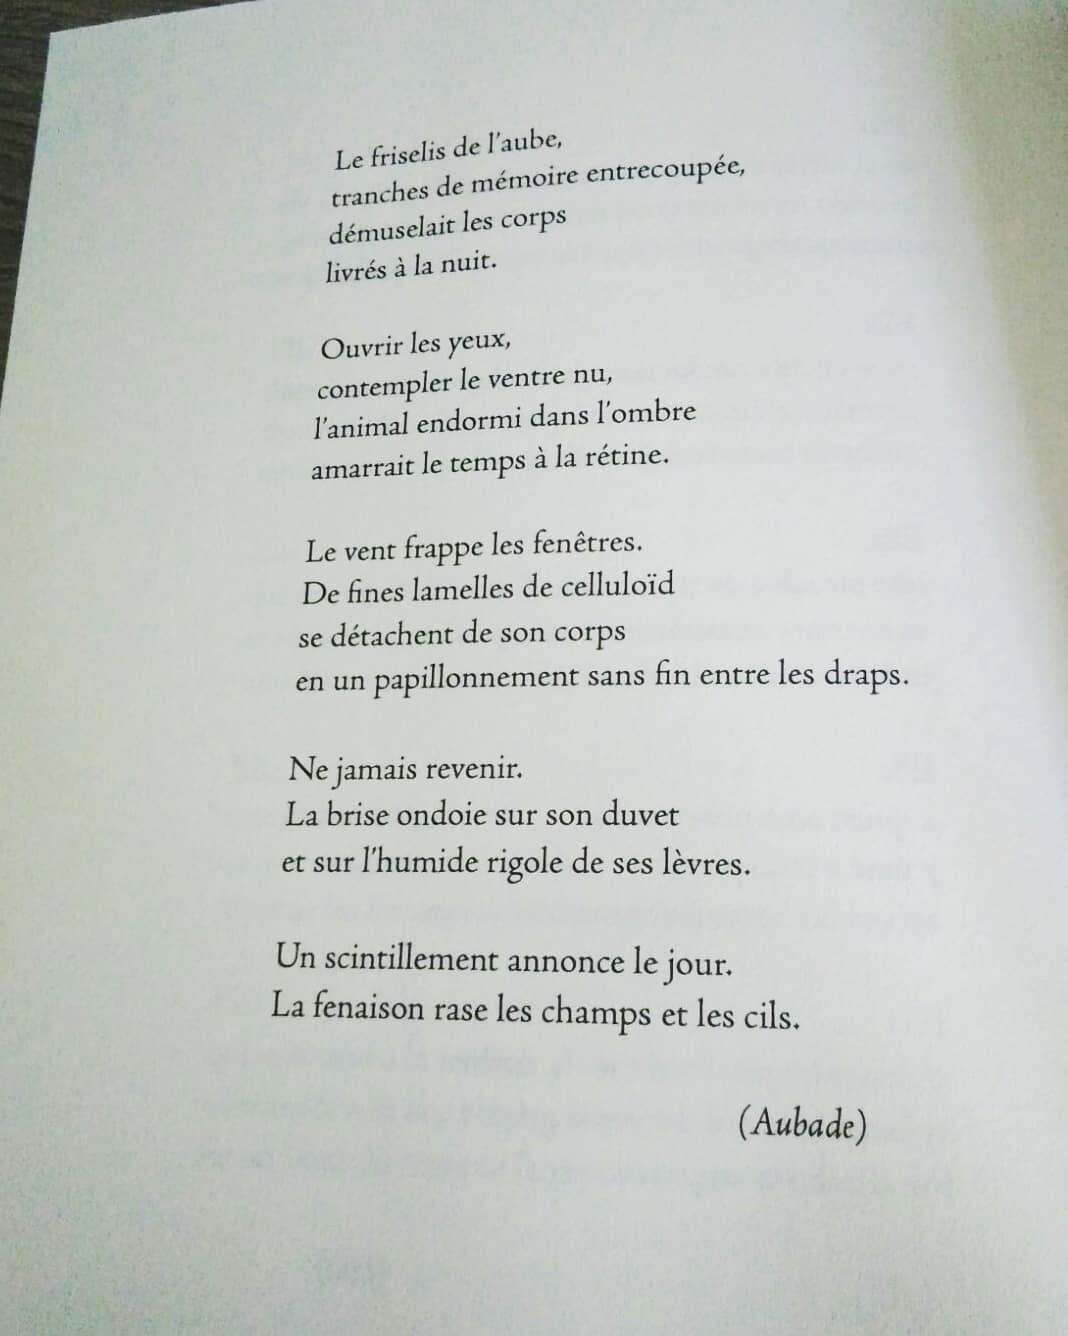 Aubade - Toni Quero